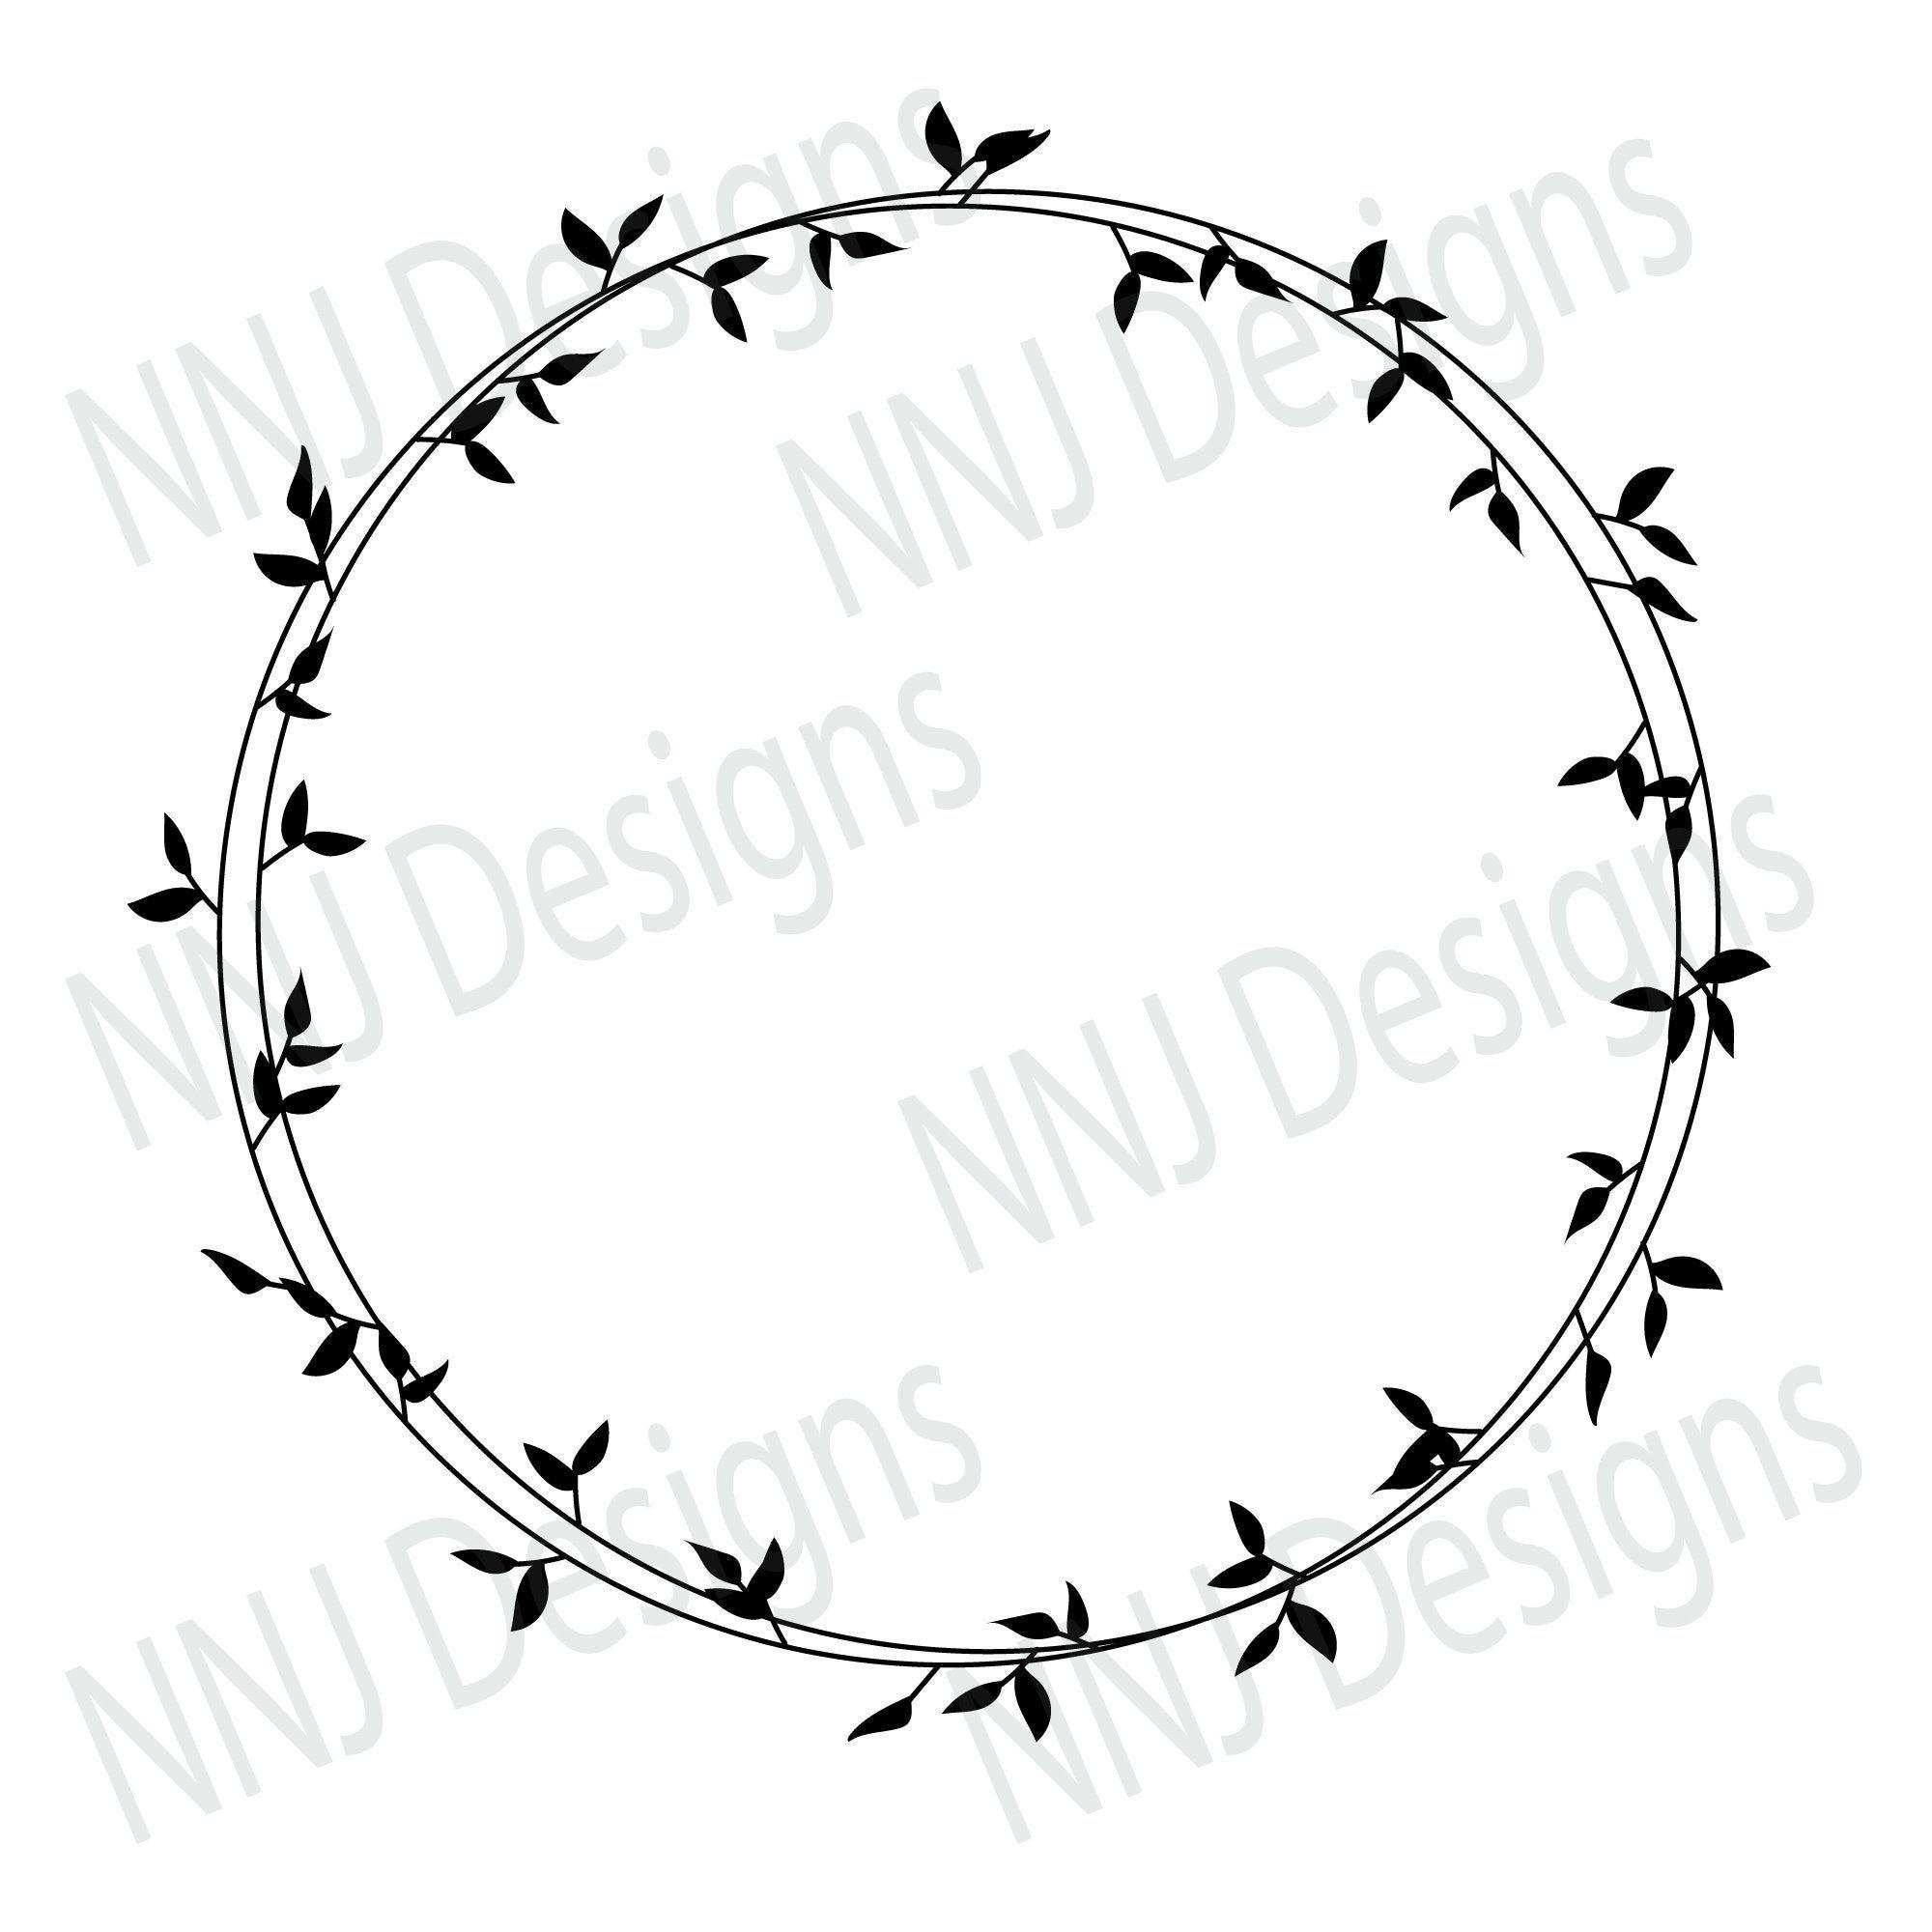 Laurel Wreath Circle Svg  Circle wreath  Four set of wreath  Single color wreath